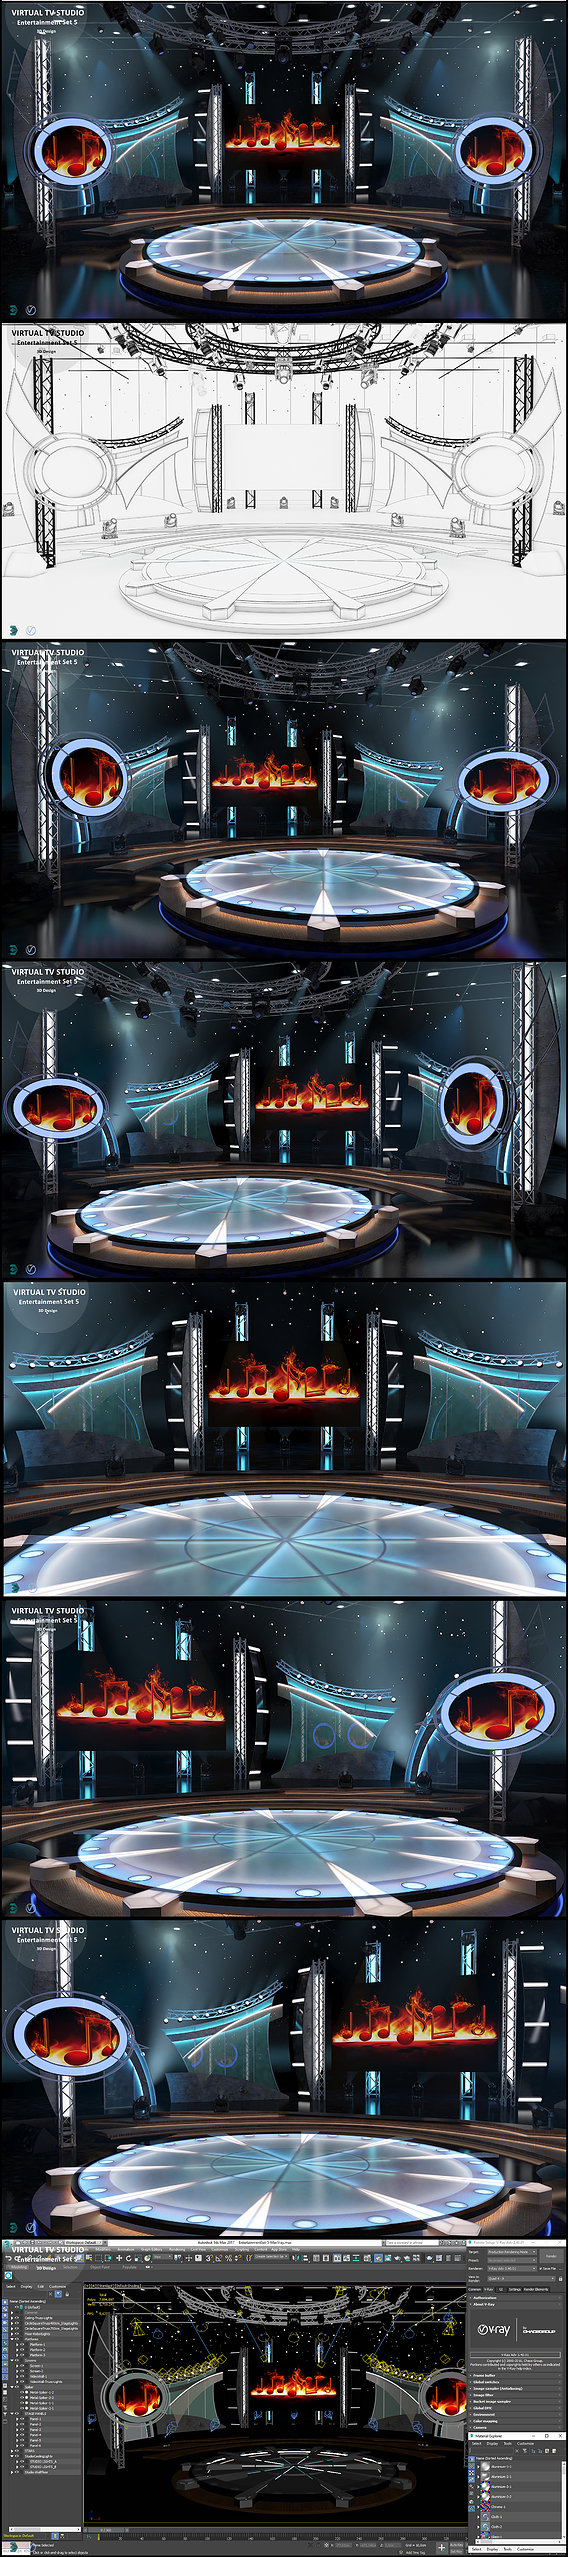 Virtual TV Studio Entertainment Set 5  - 3D Model Designs